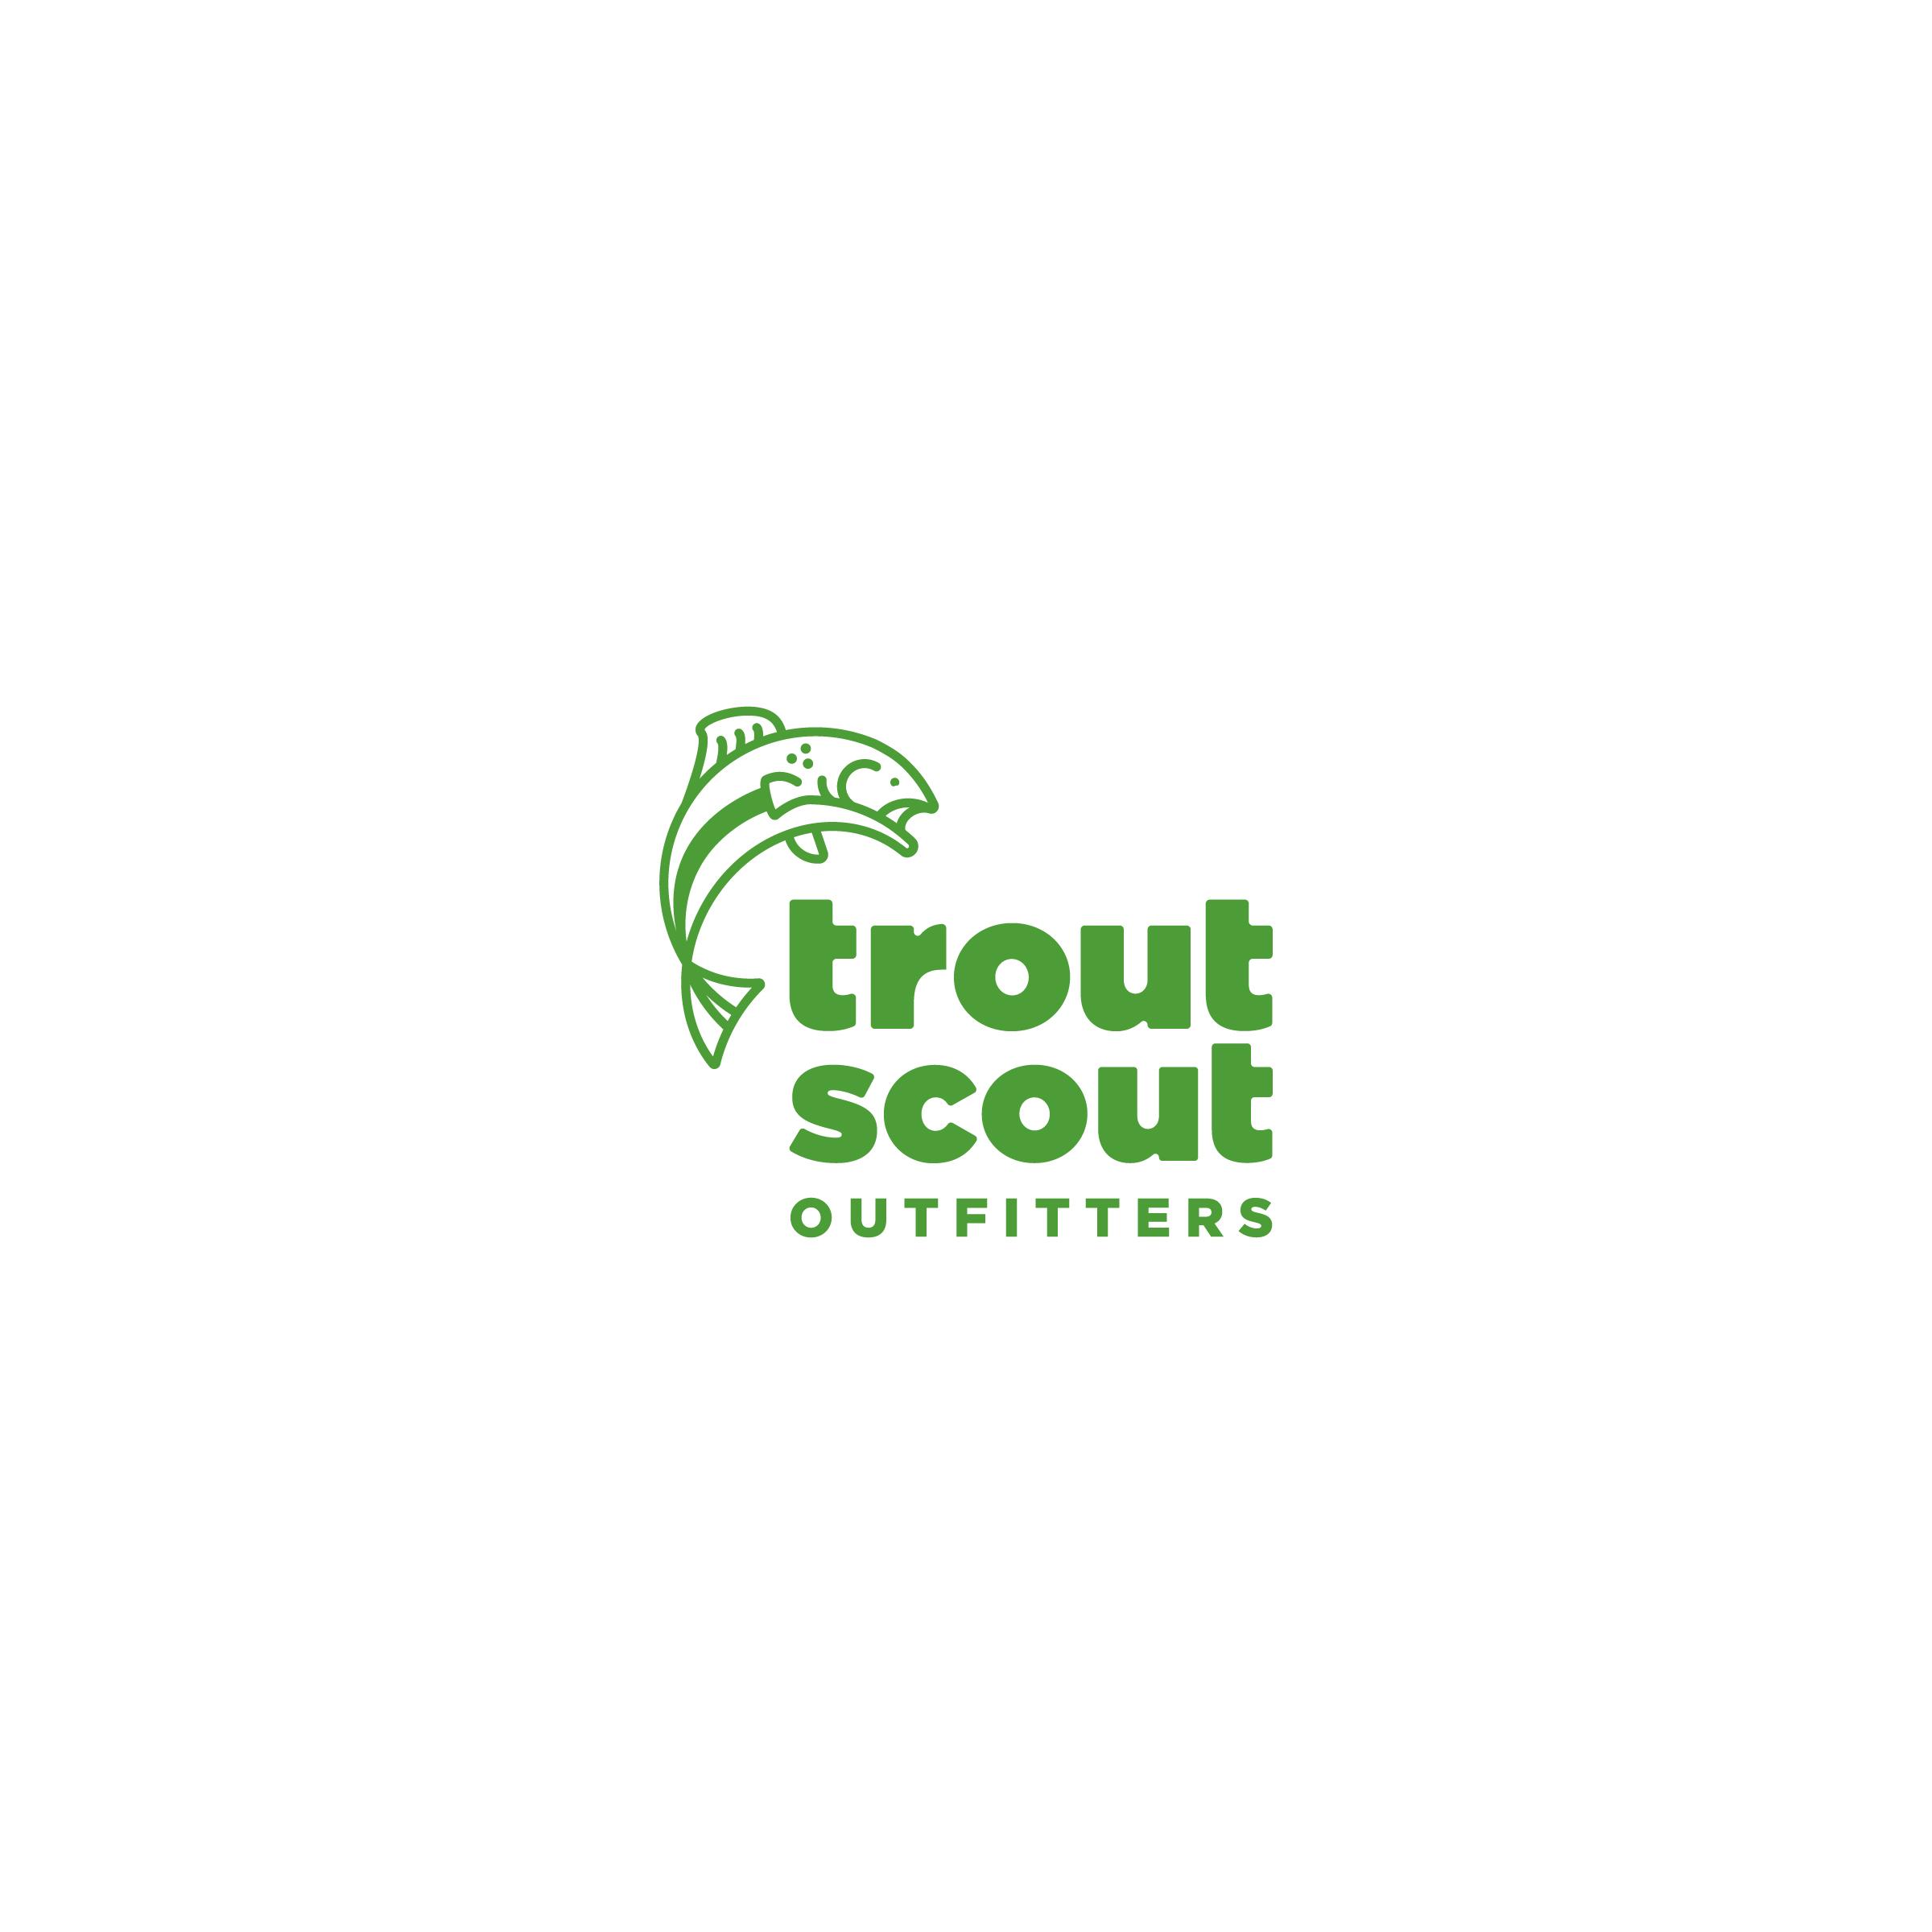 TroutScoutOutfitters_Green_Vert.jpg